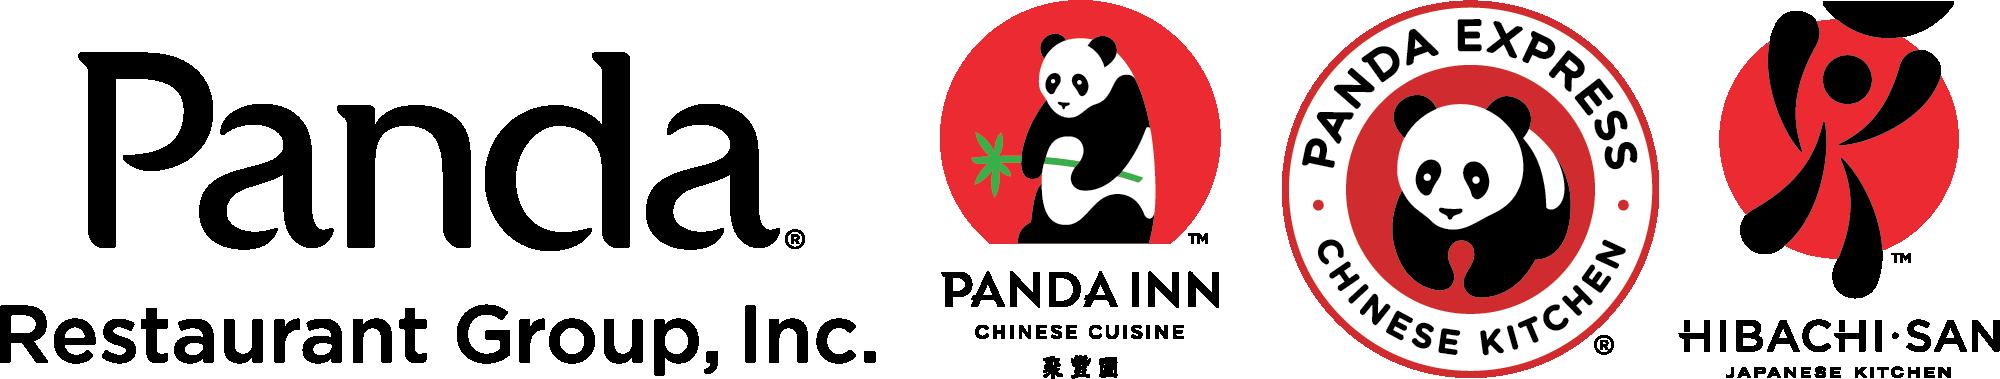 Panda Restaurant Group logo